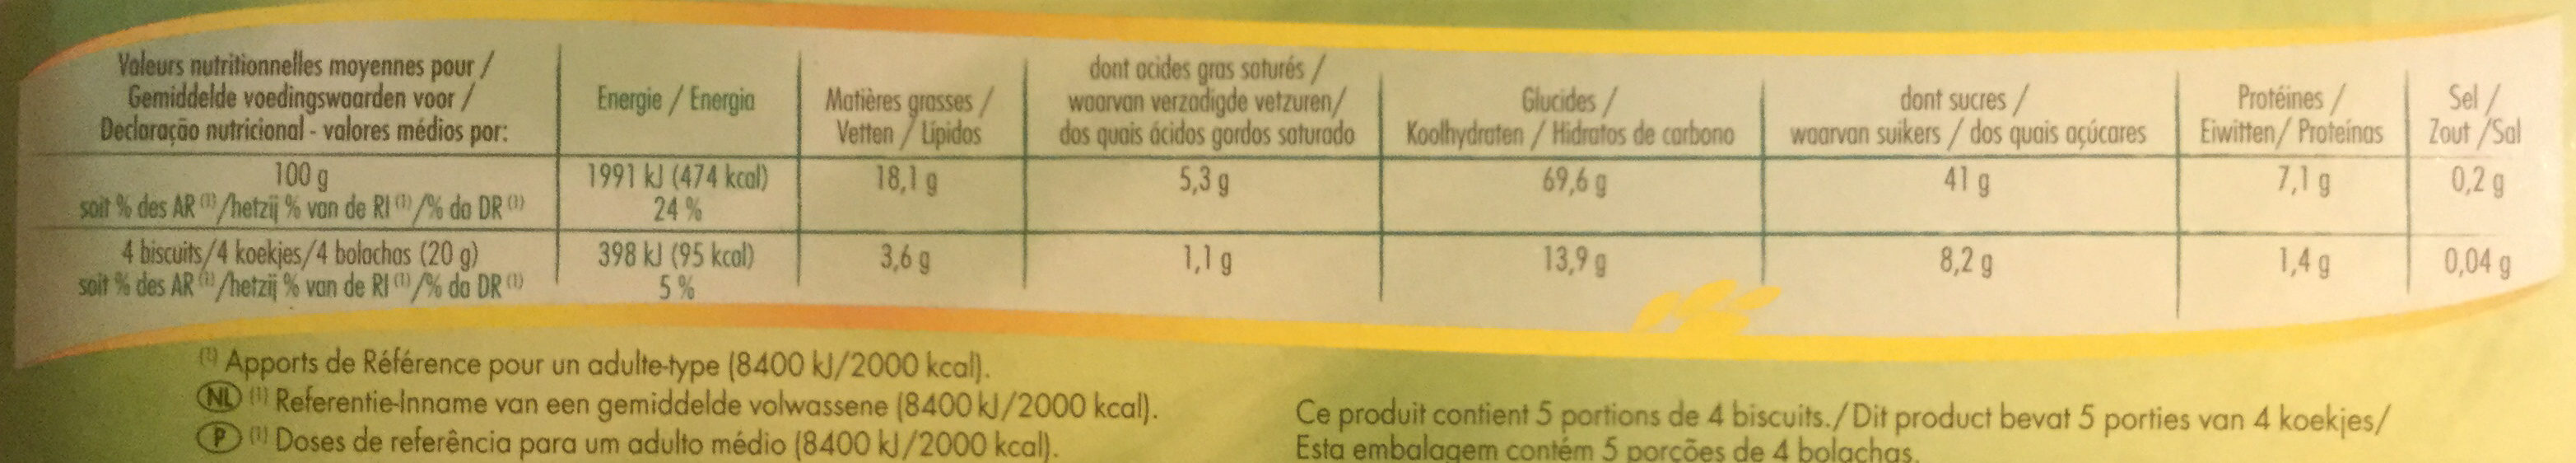 Tuiles aux Amandes - Voedingswaarden